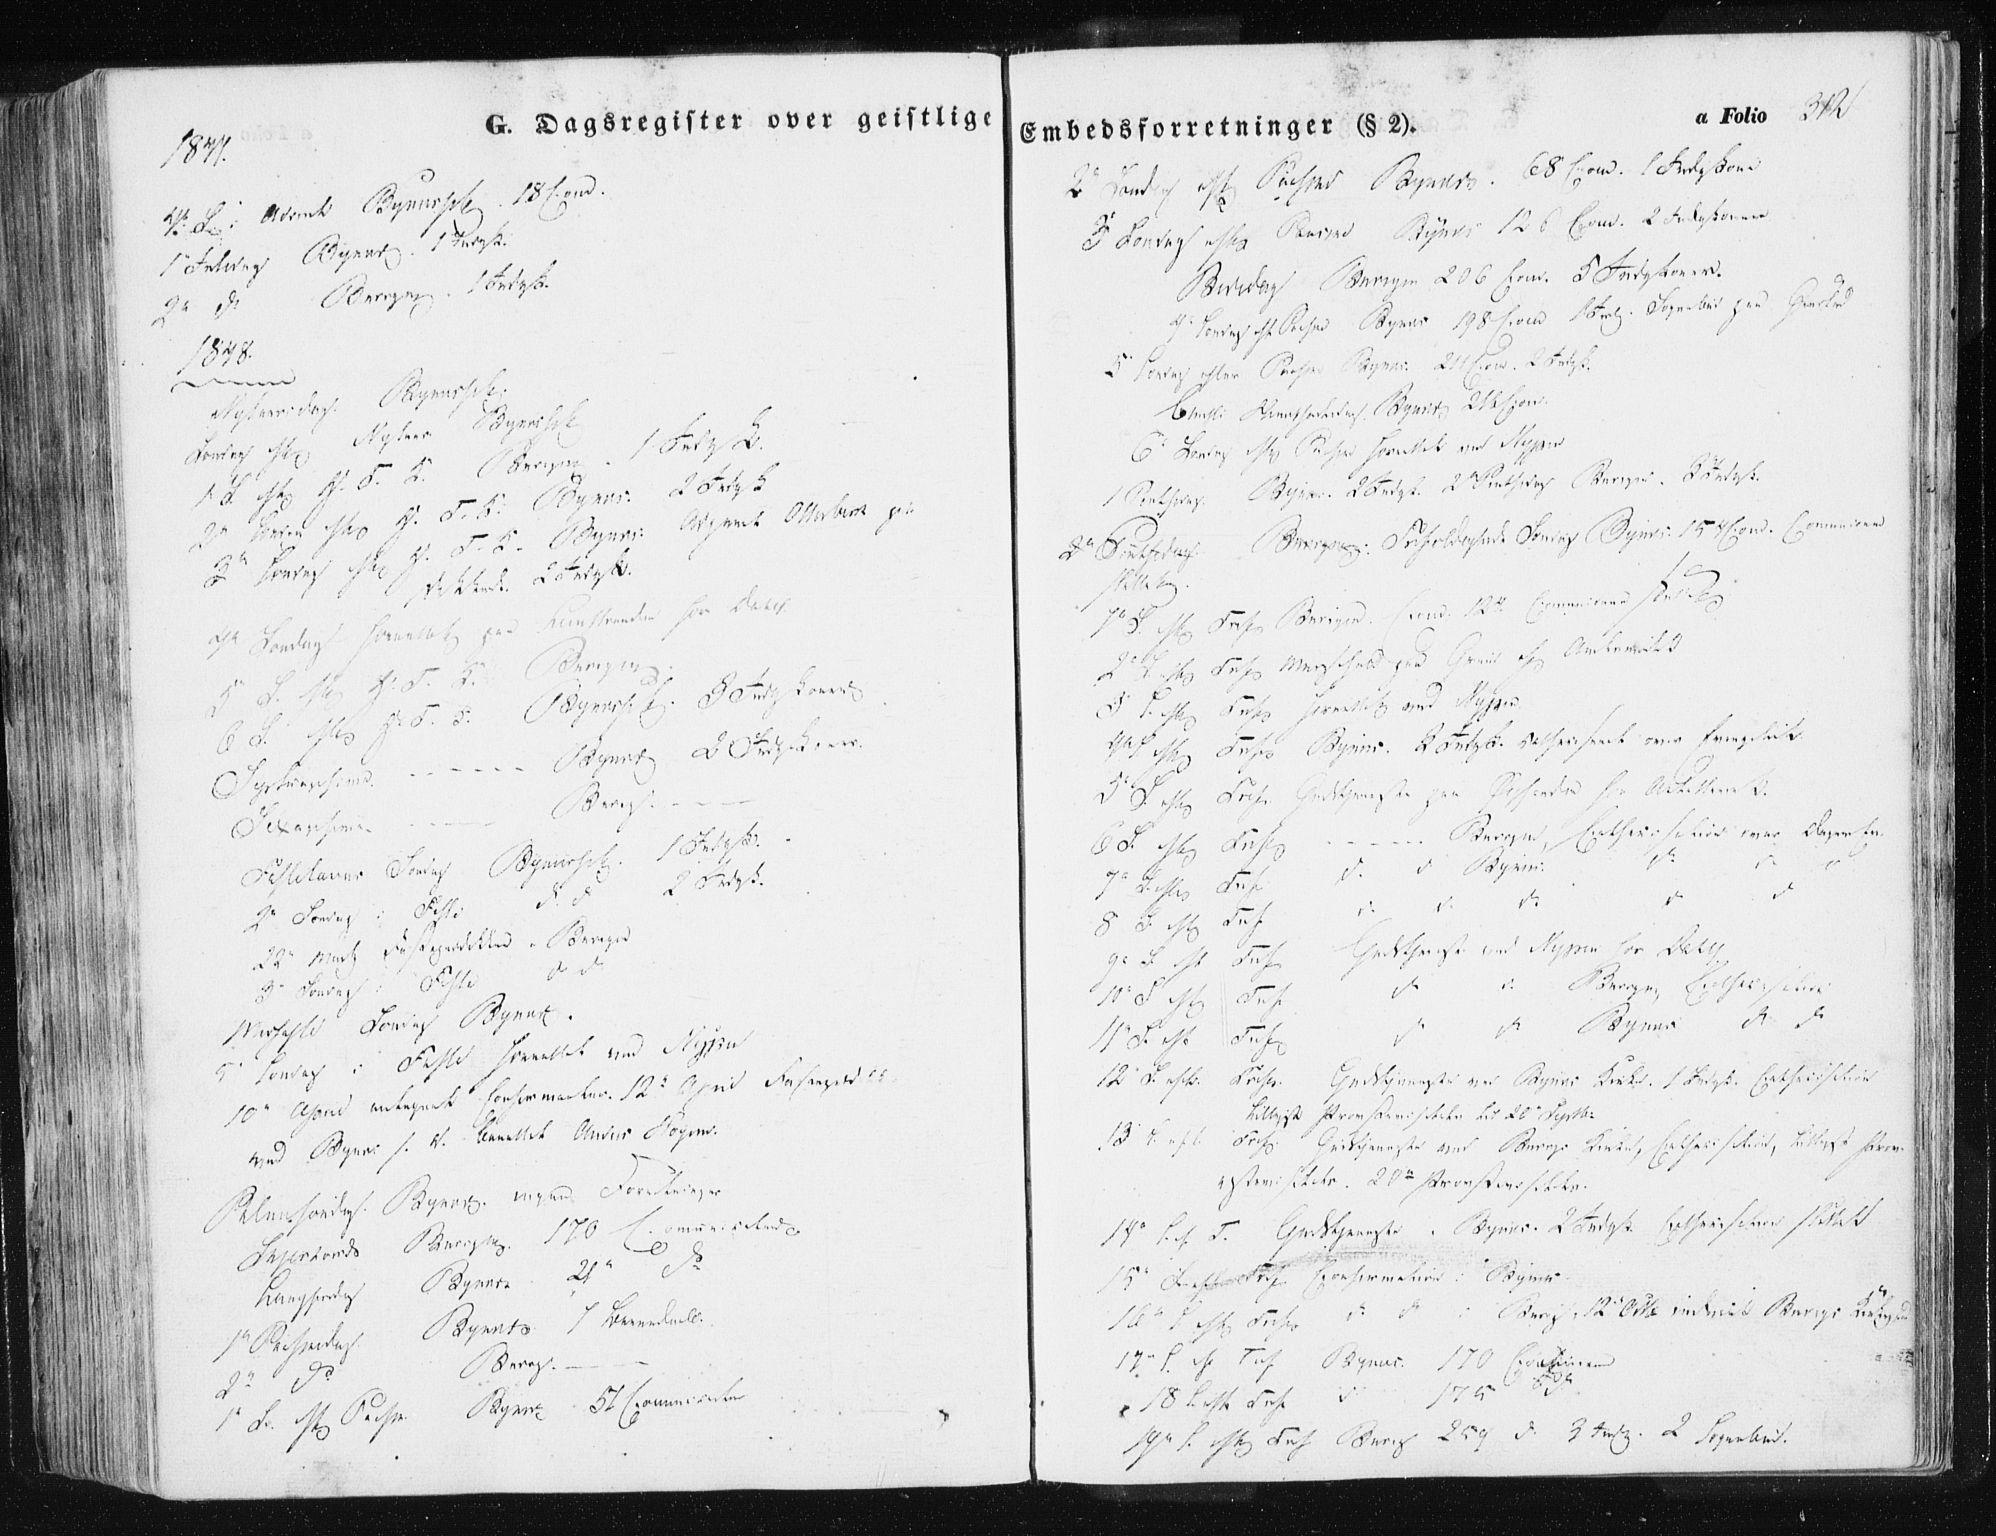 SAT, Ministerialprotokoller, klokkerbøker og fødselsregistre - Sør-Trøndelag, 612/L0376: Parish register (official) no. 612A08, 1846-1859, p. 312